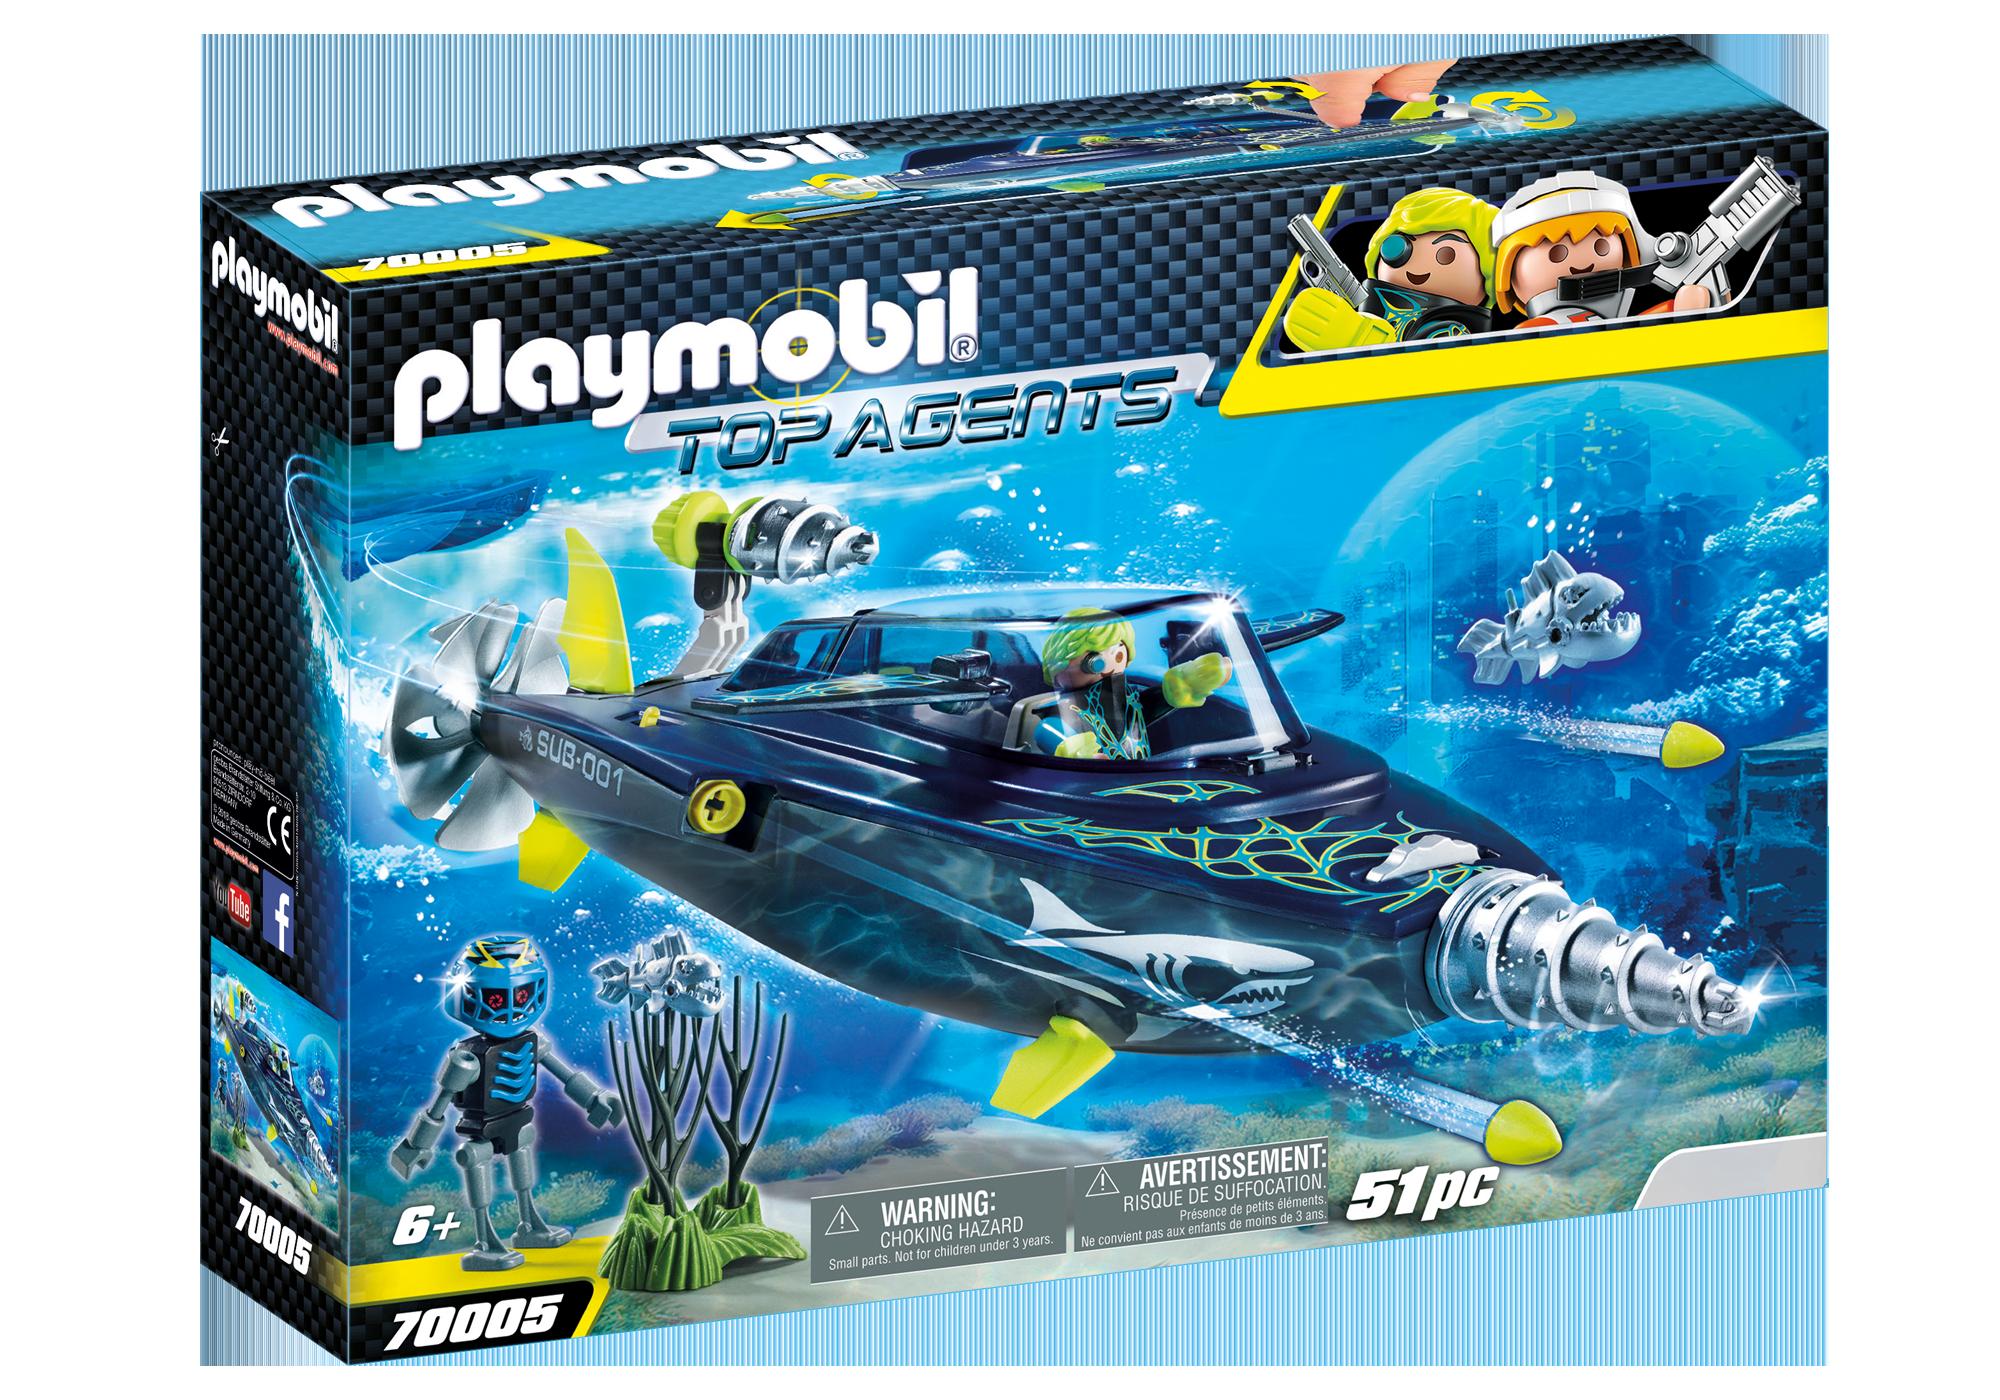 http://media.playmobil.com/i/playmobil/70005_product_box_front/TEAM S.H.A.R.K. Destroyer med bor